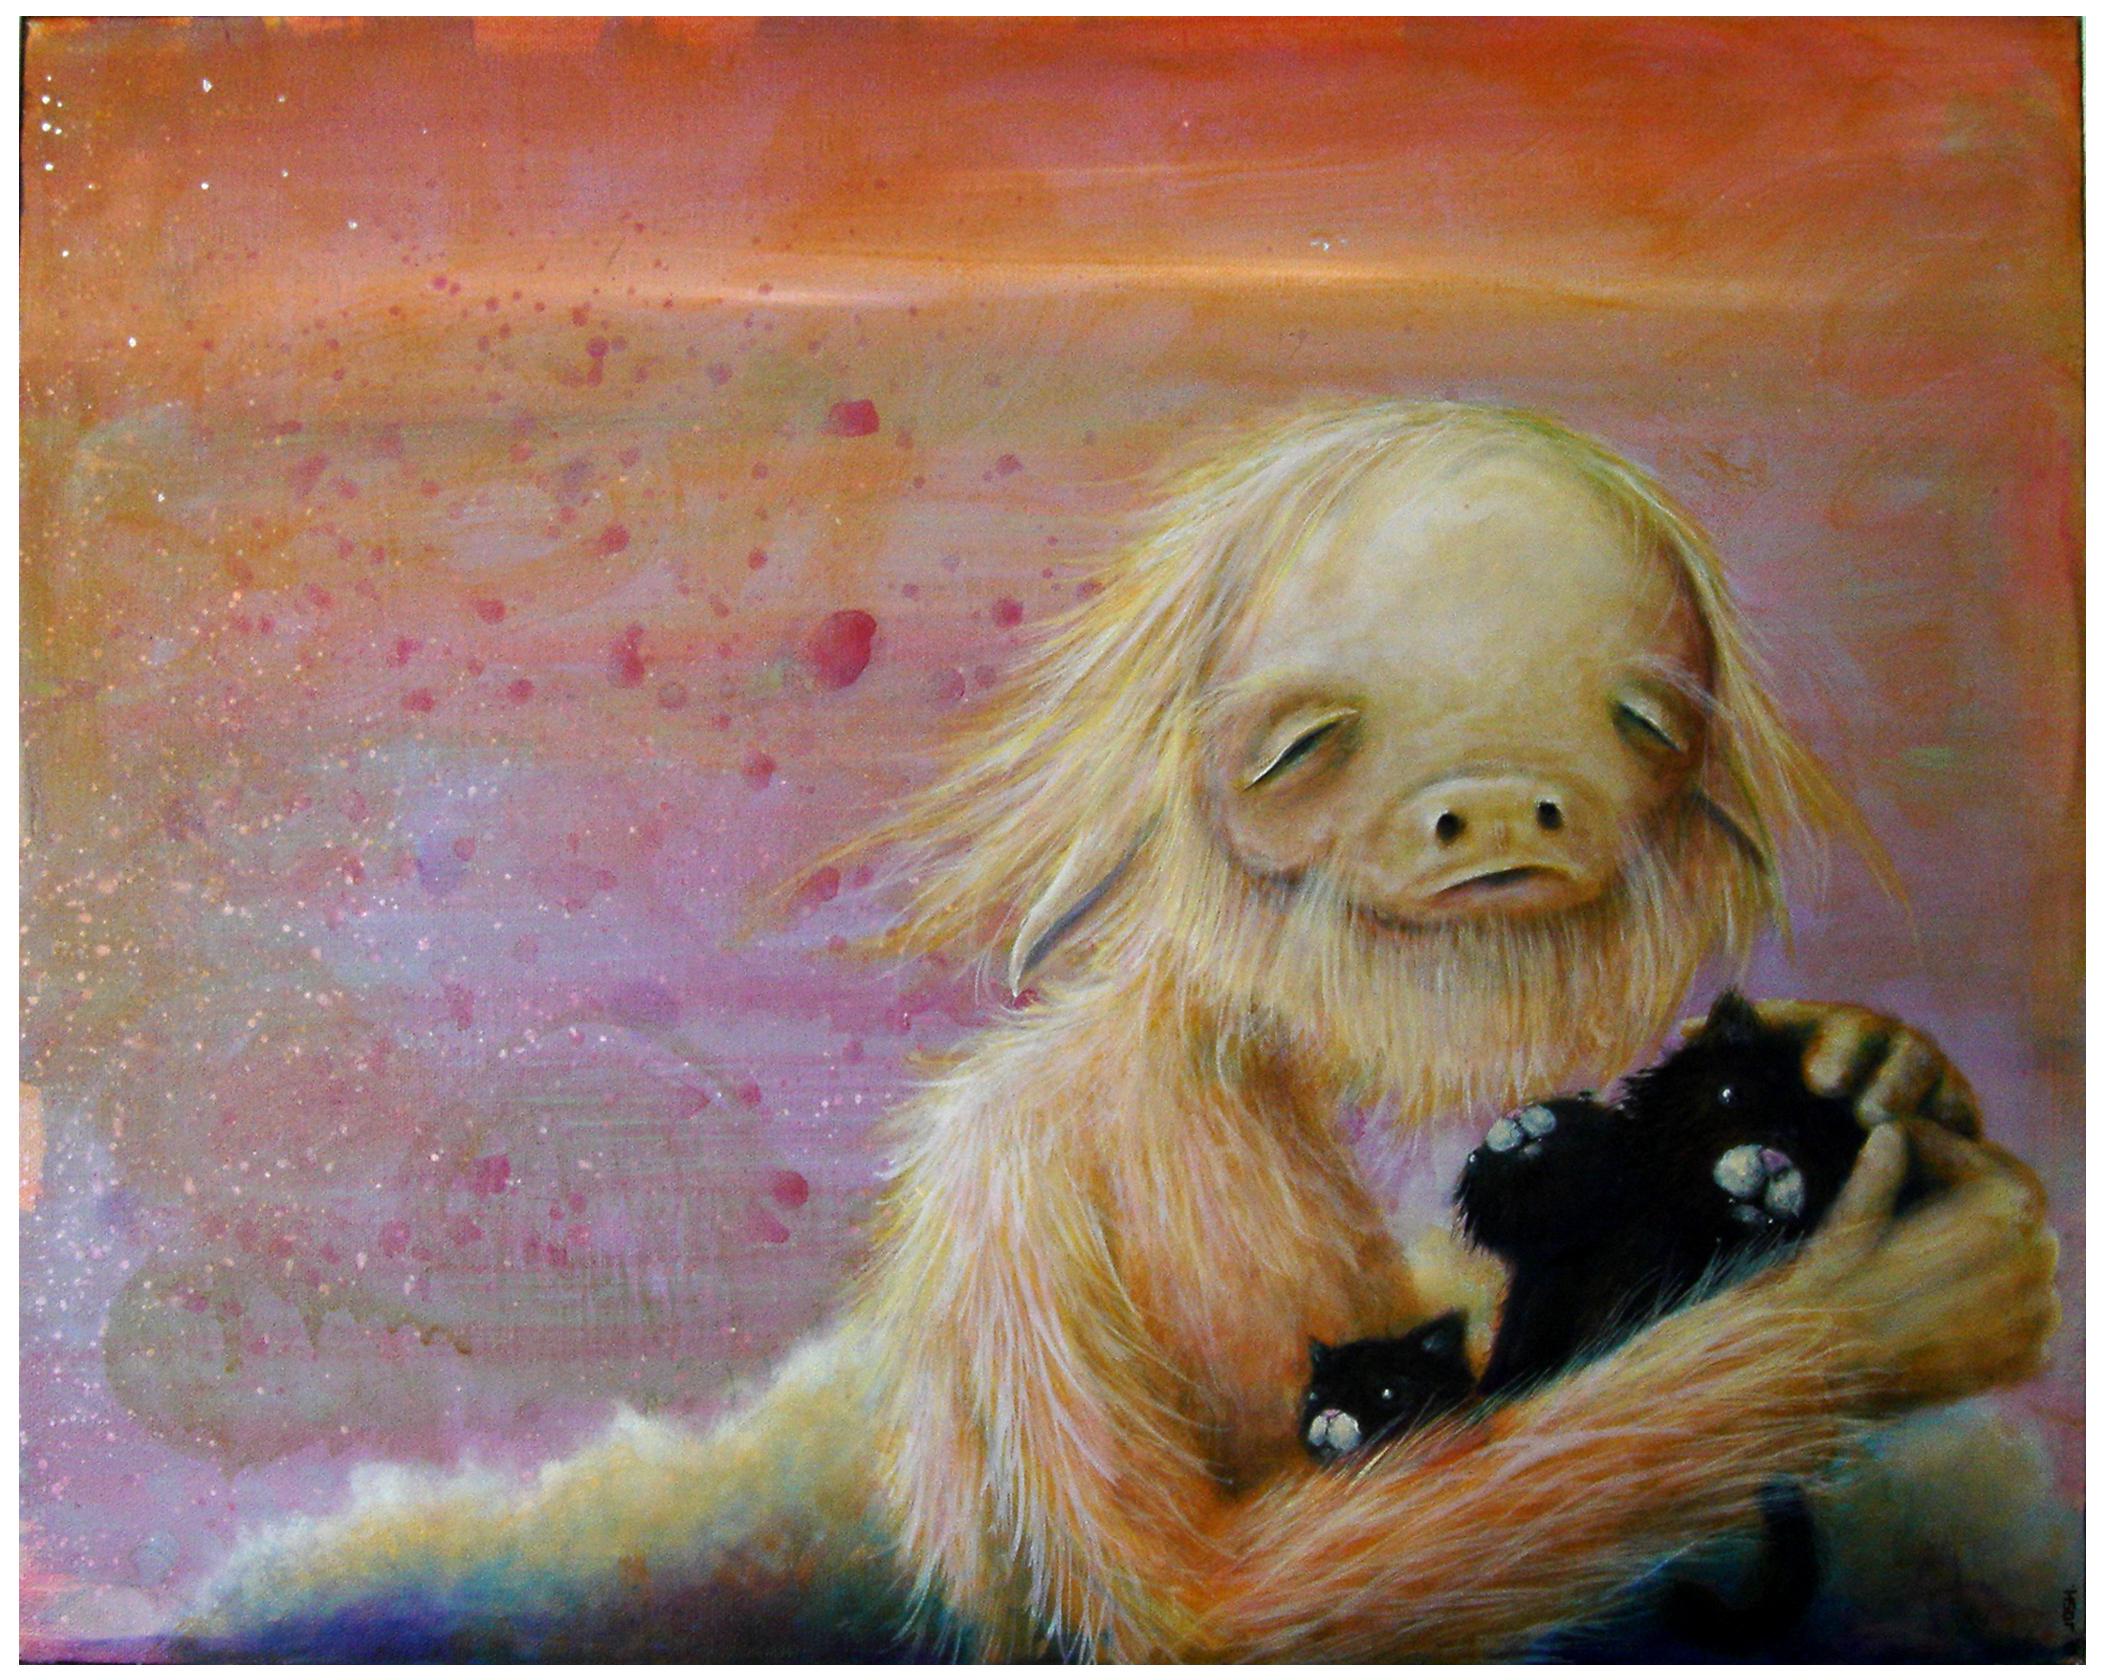 chimera-love-cats-too